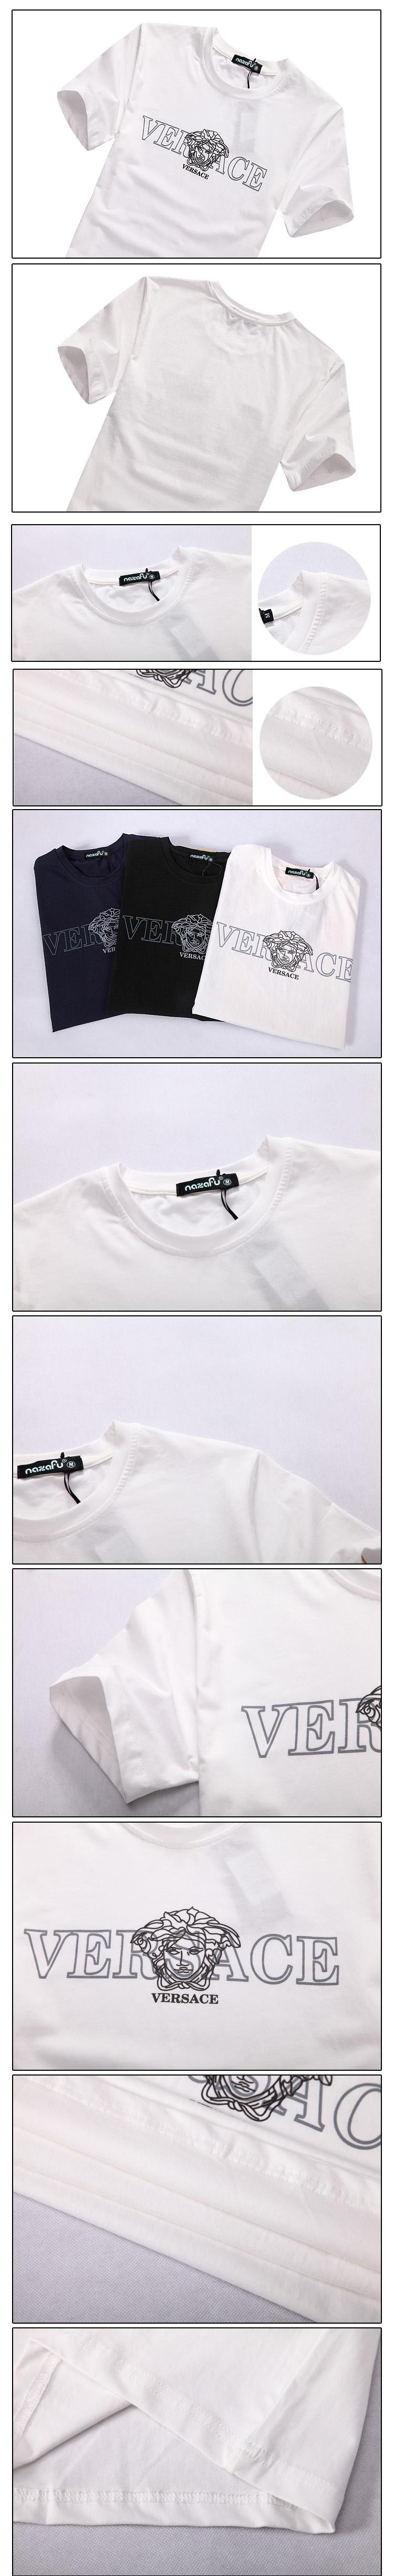 Áo thun cao cấp versace trắng at480 - 1